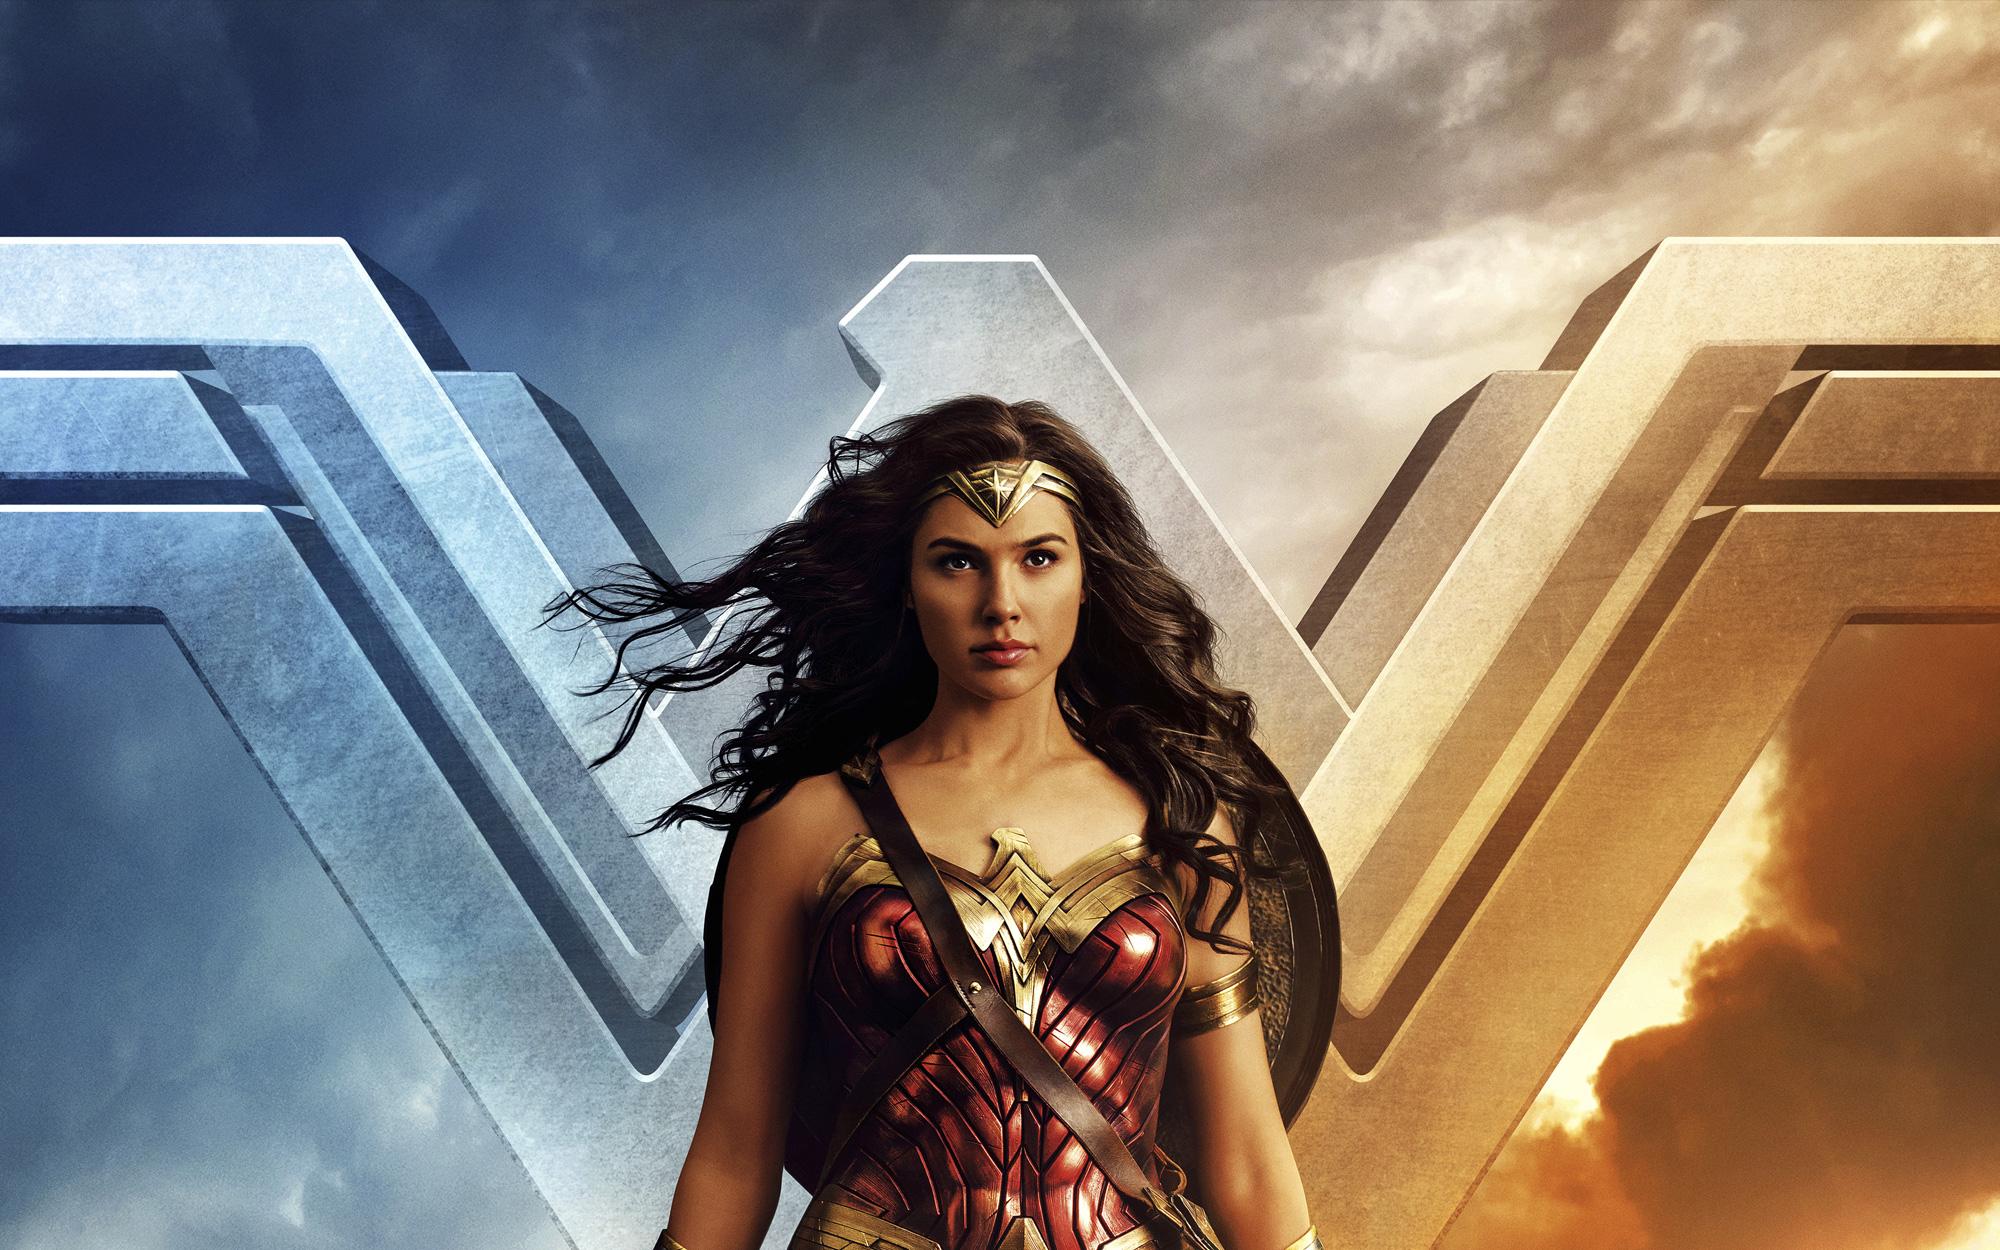 Wonder Woman Hd 2017 Wallpapers: Fondos Wonder Woman, Wallpapers La Mujer Maravilla 2017